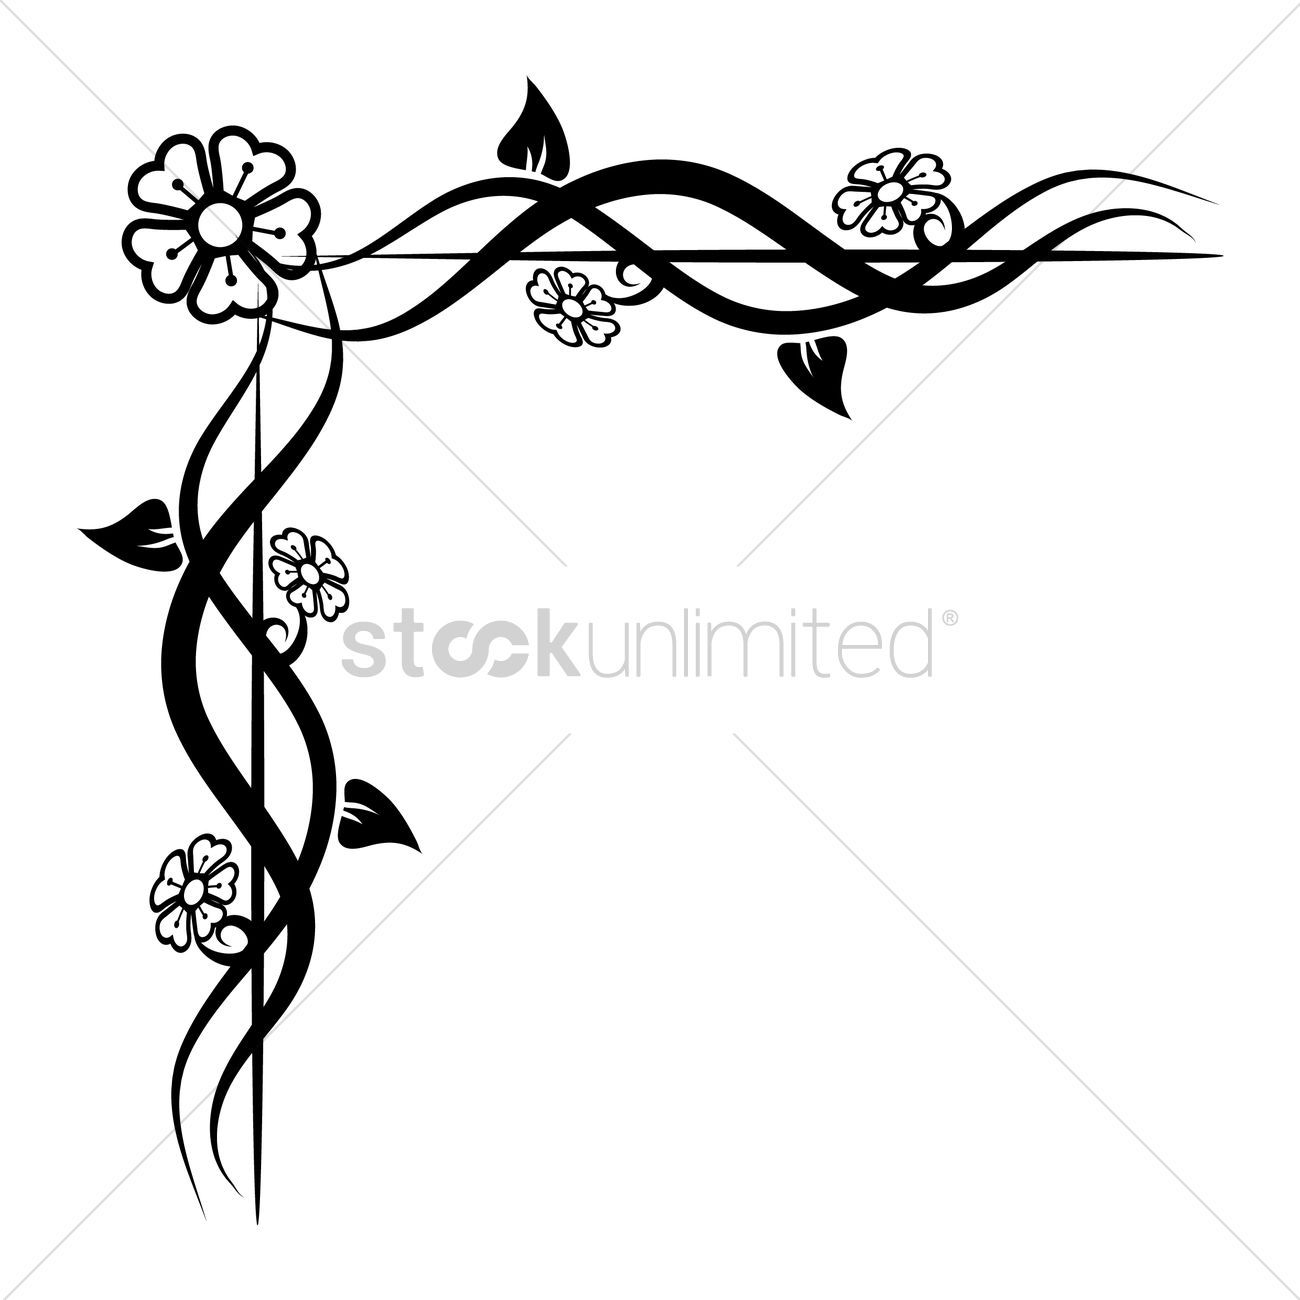 1300x1300 Flower Corner Designs Black And White